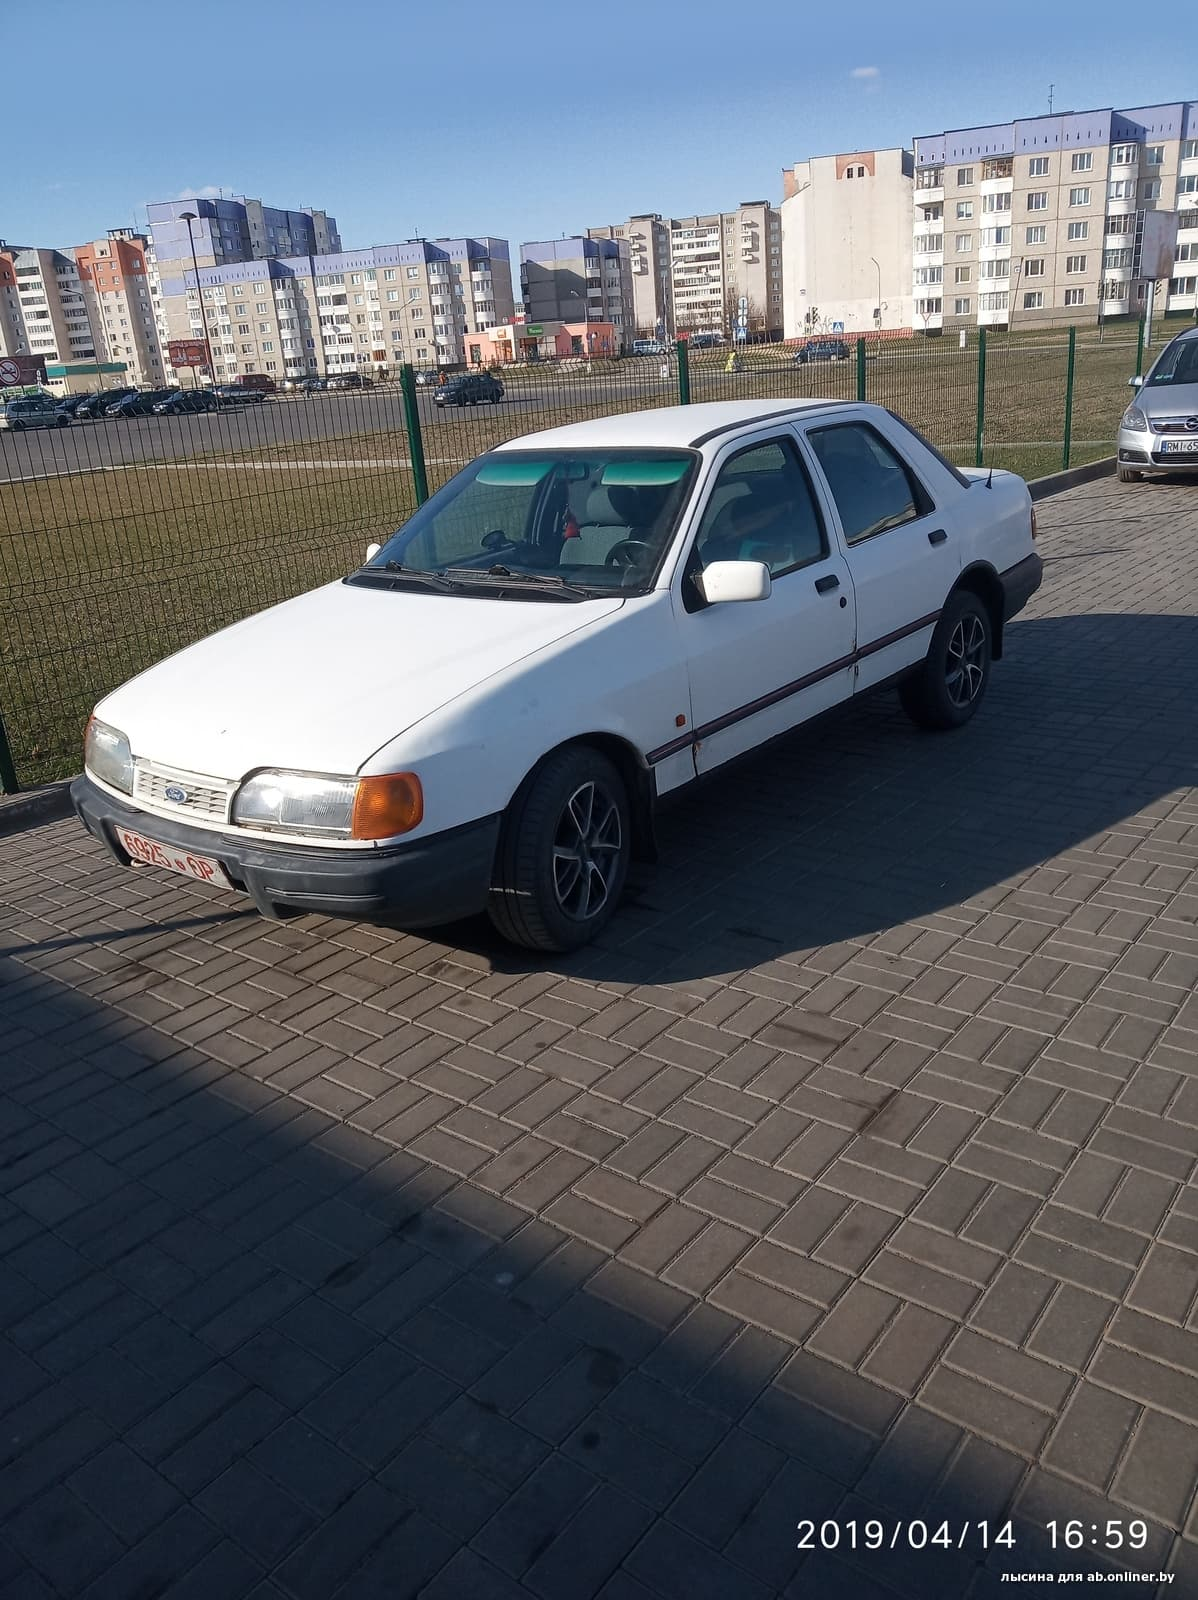 Ford Sierra Lx